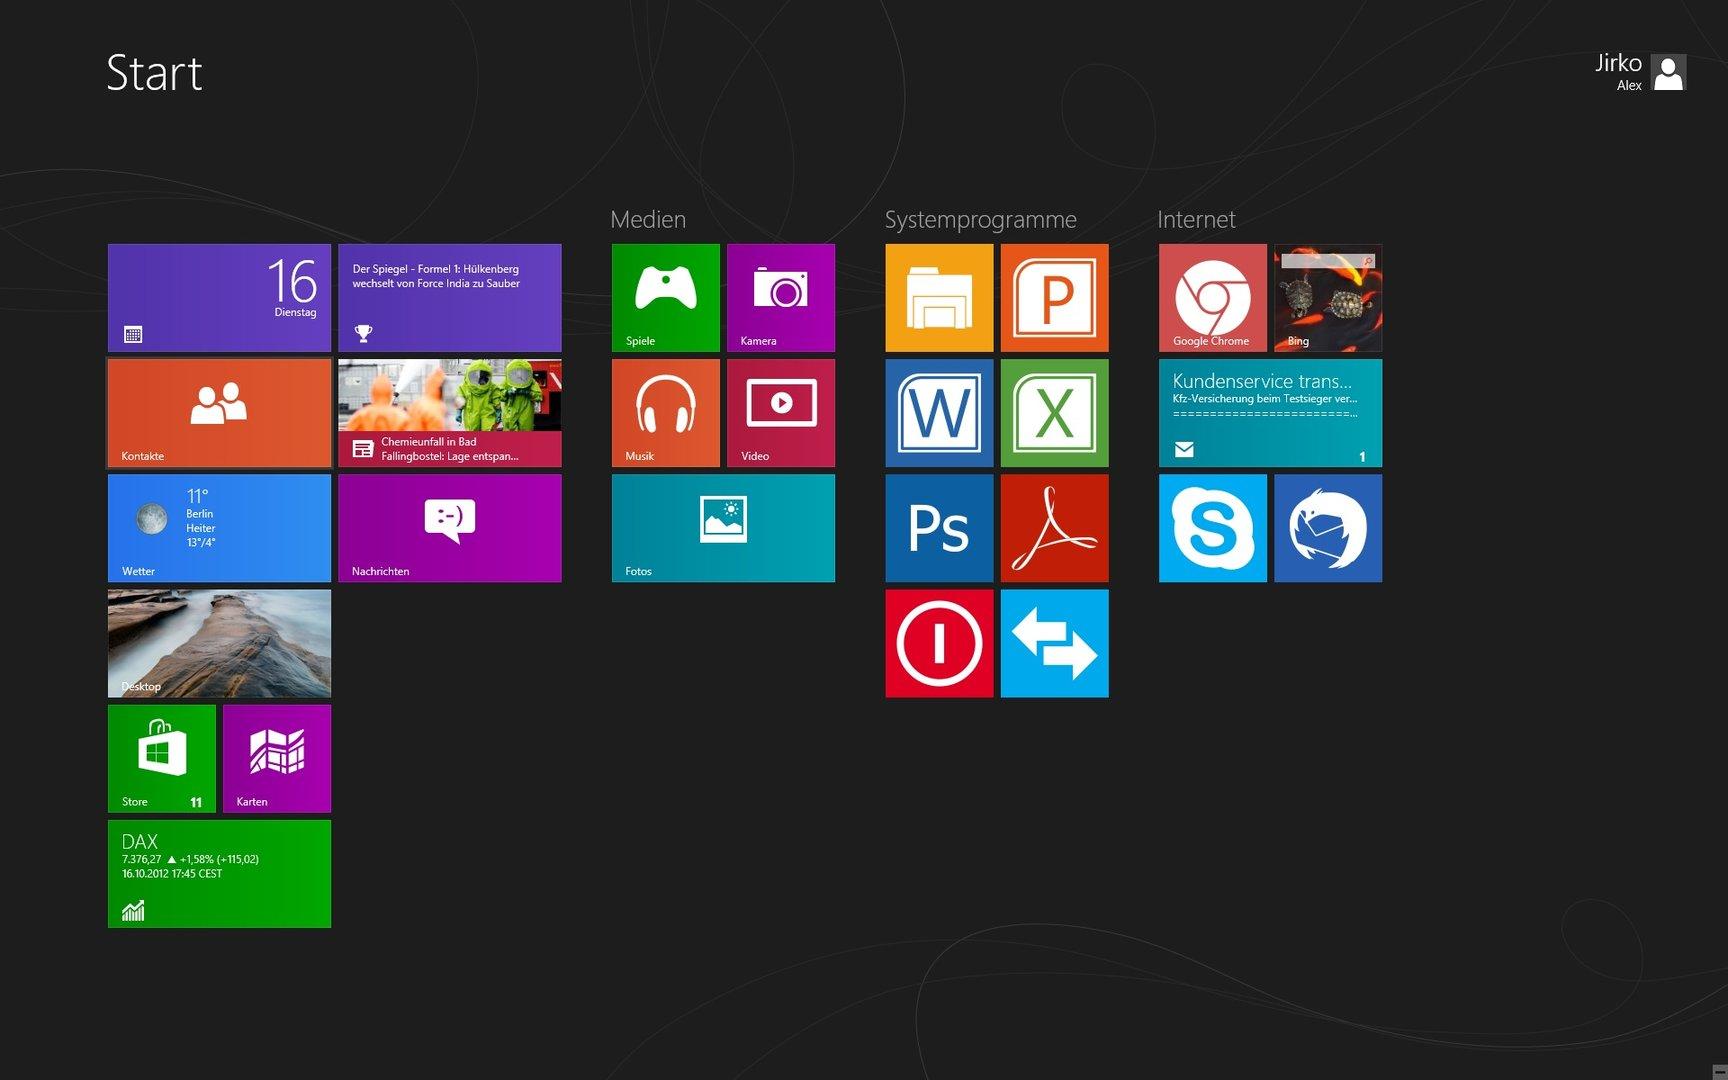 Windows 8 Modern UI mit angepasstem Tiles-Design